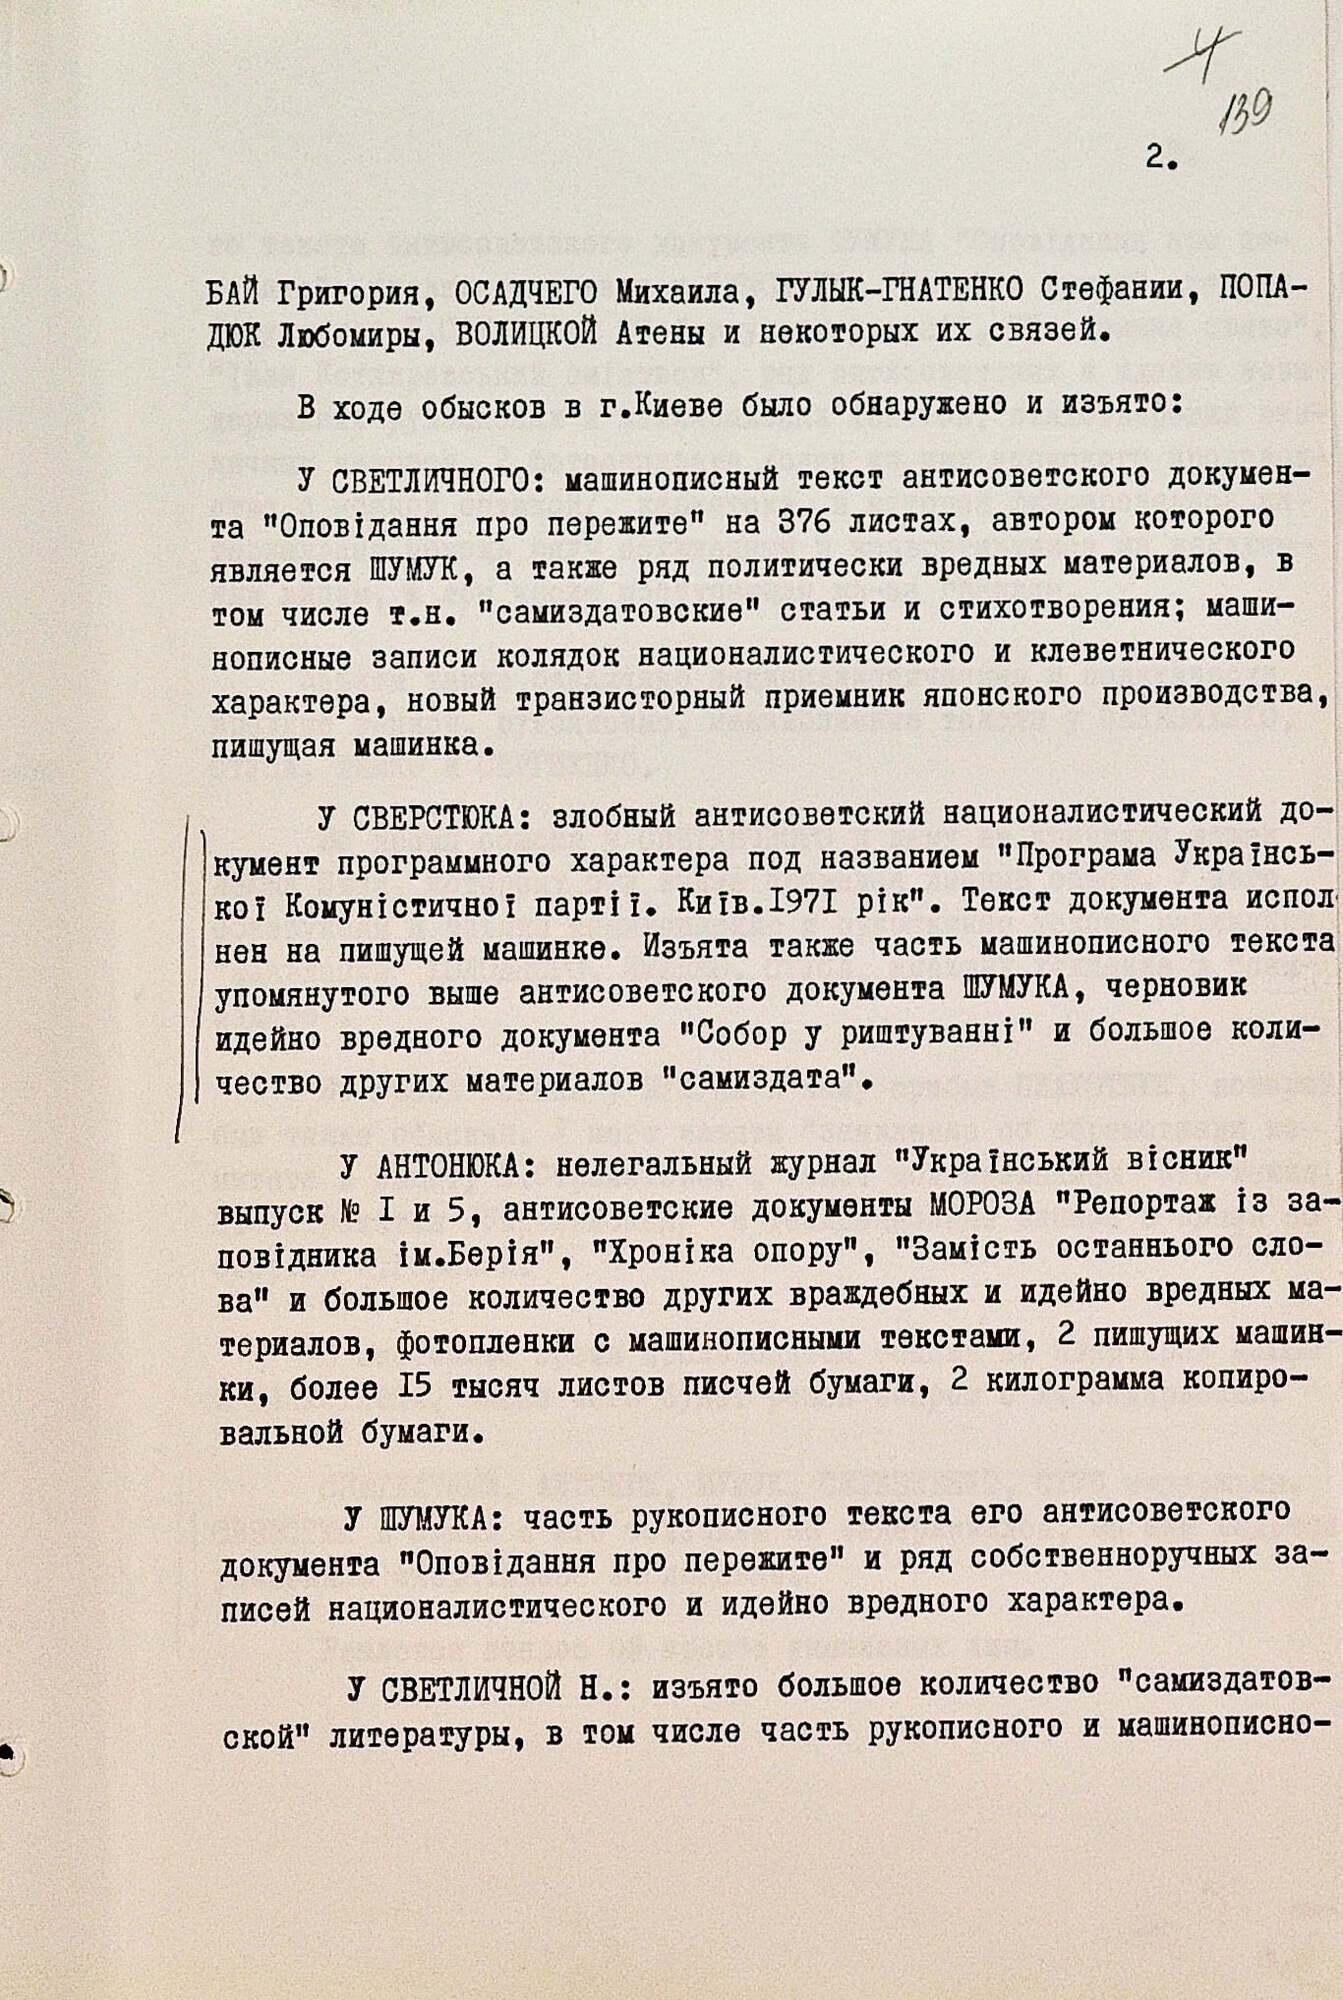 Facebook / Служба безпеки України